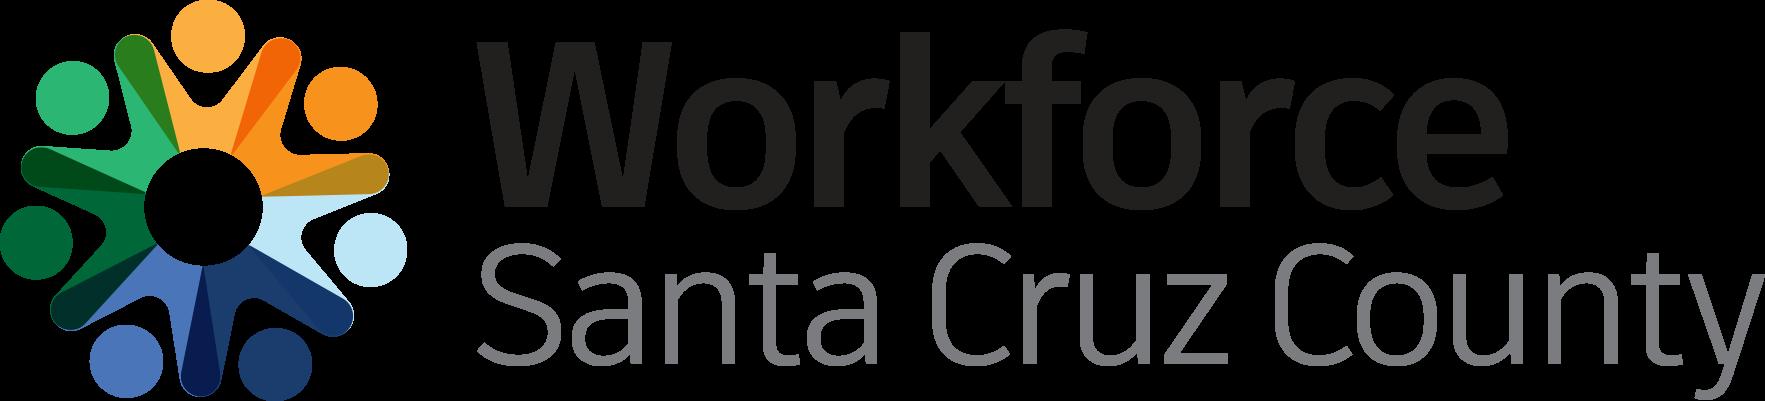 Workforce Santa Cruz County